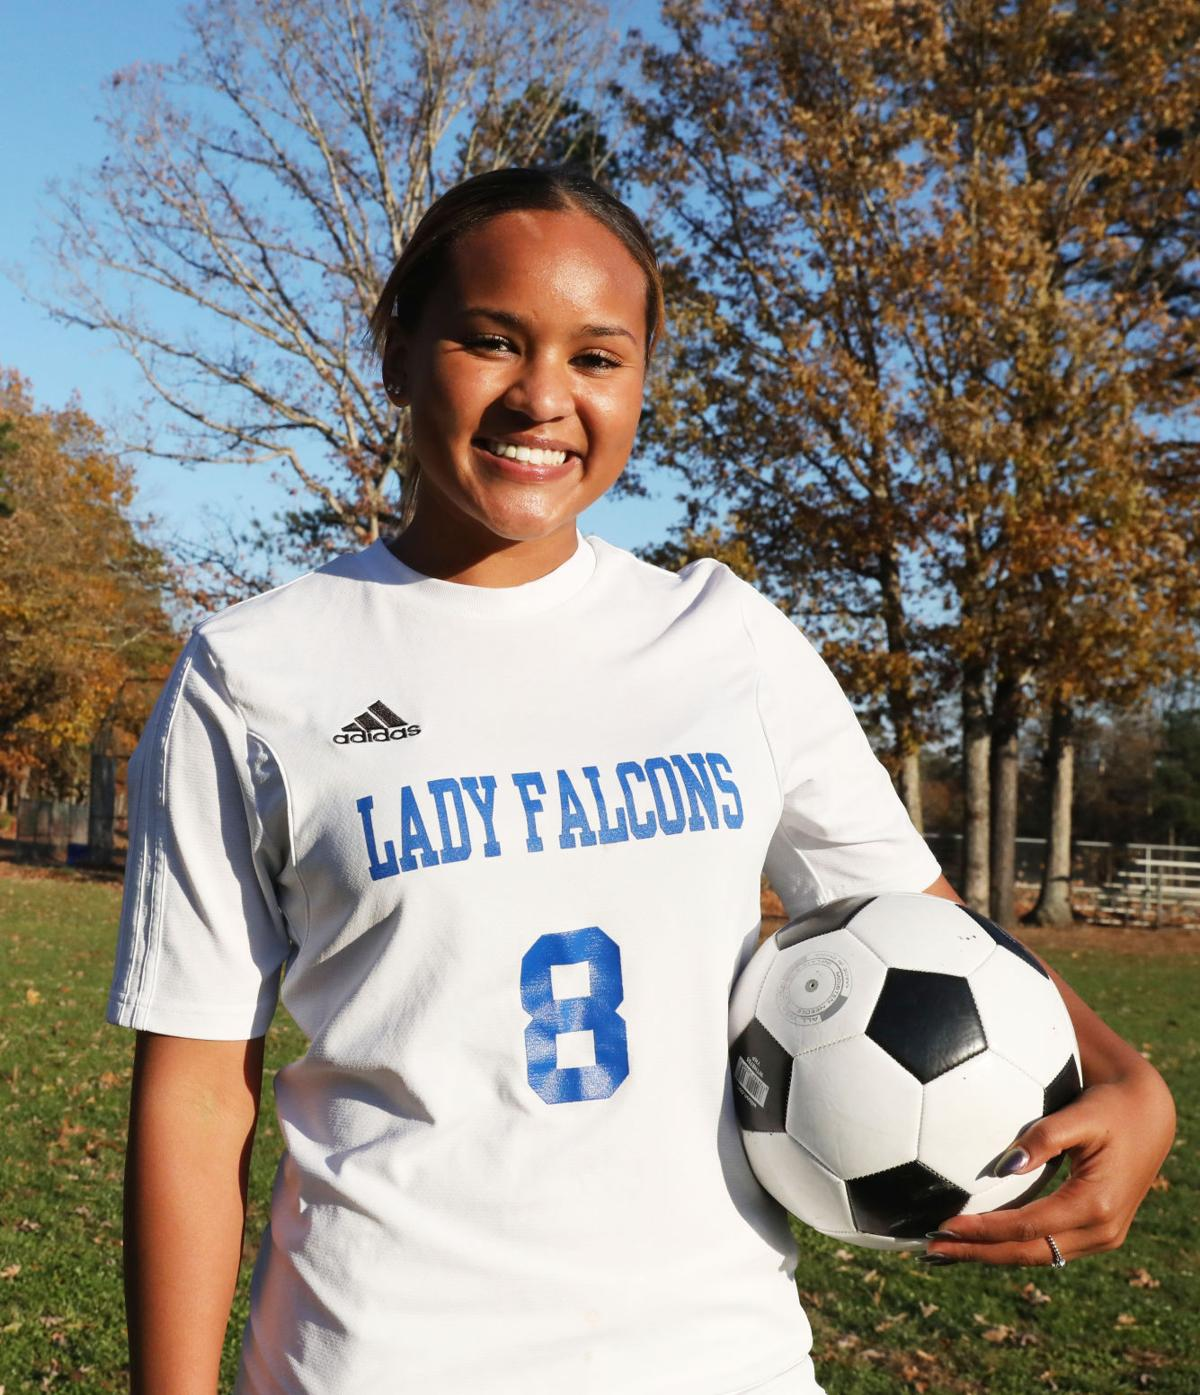 Player of the Year: Gabi Johnson, Oakcrest